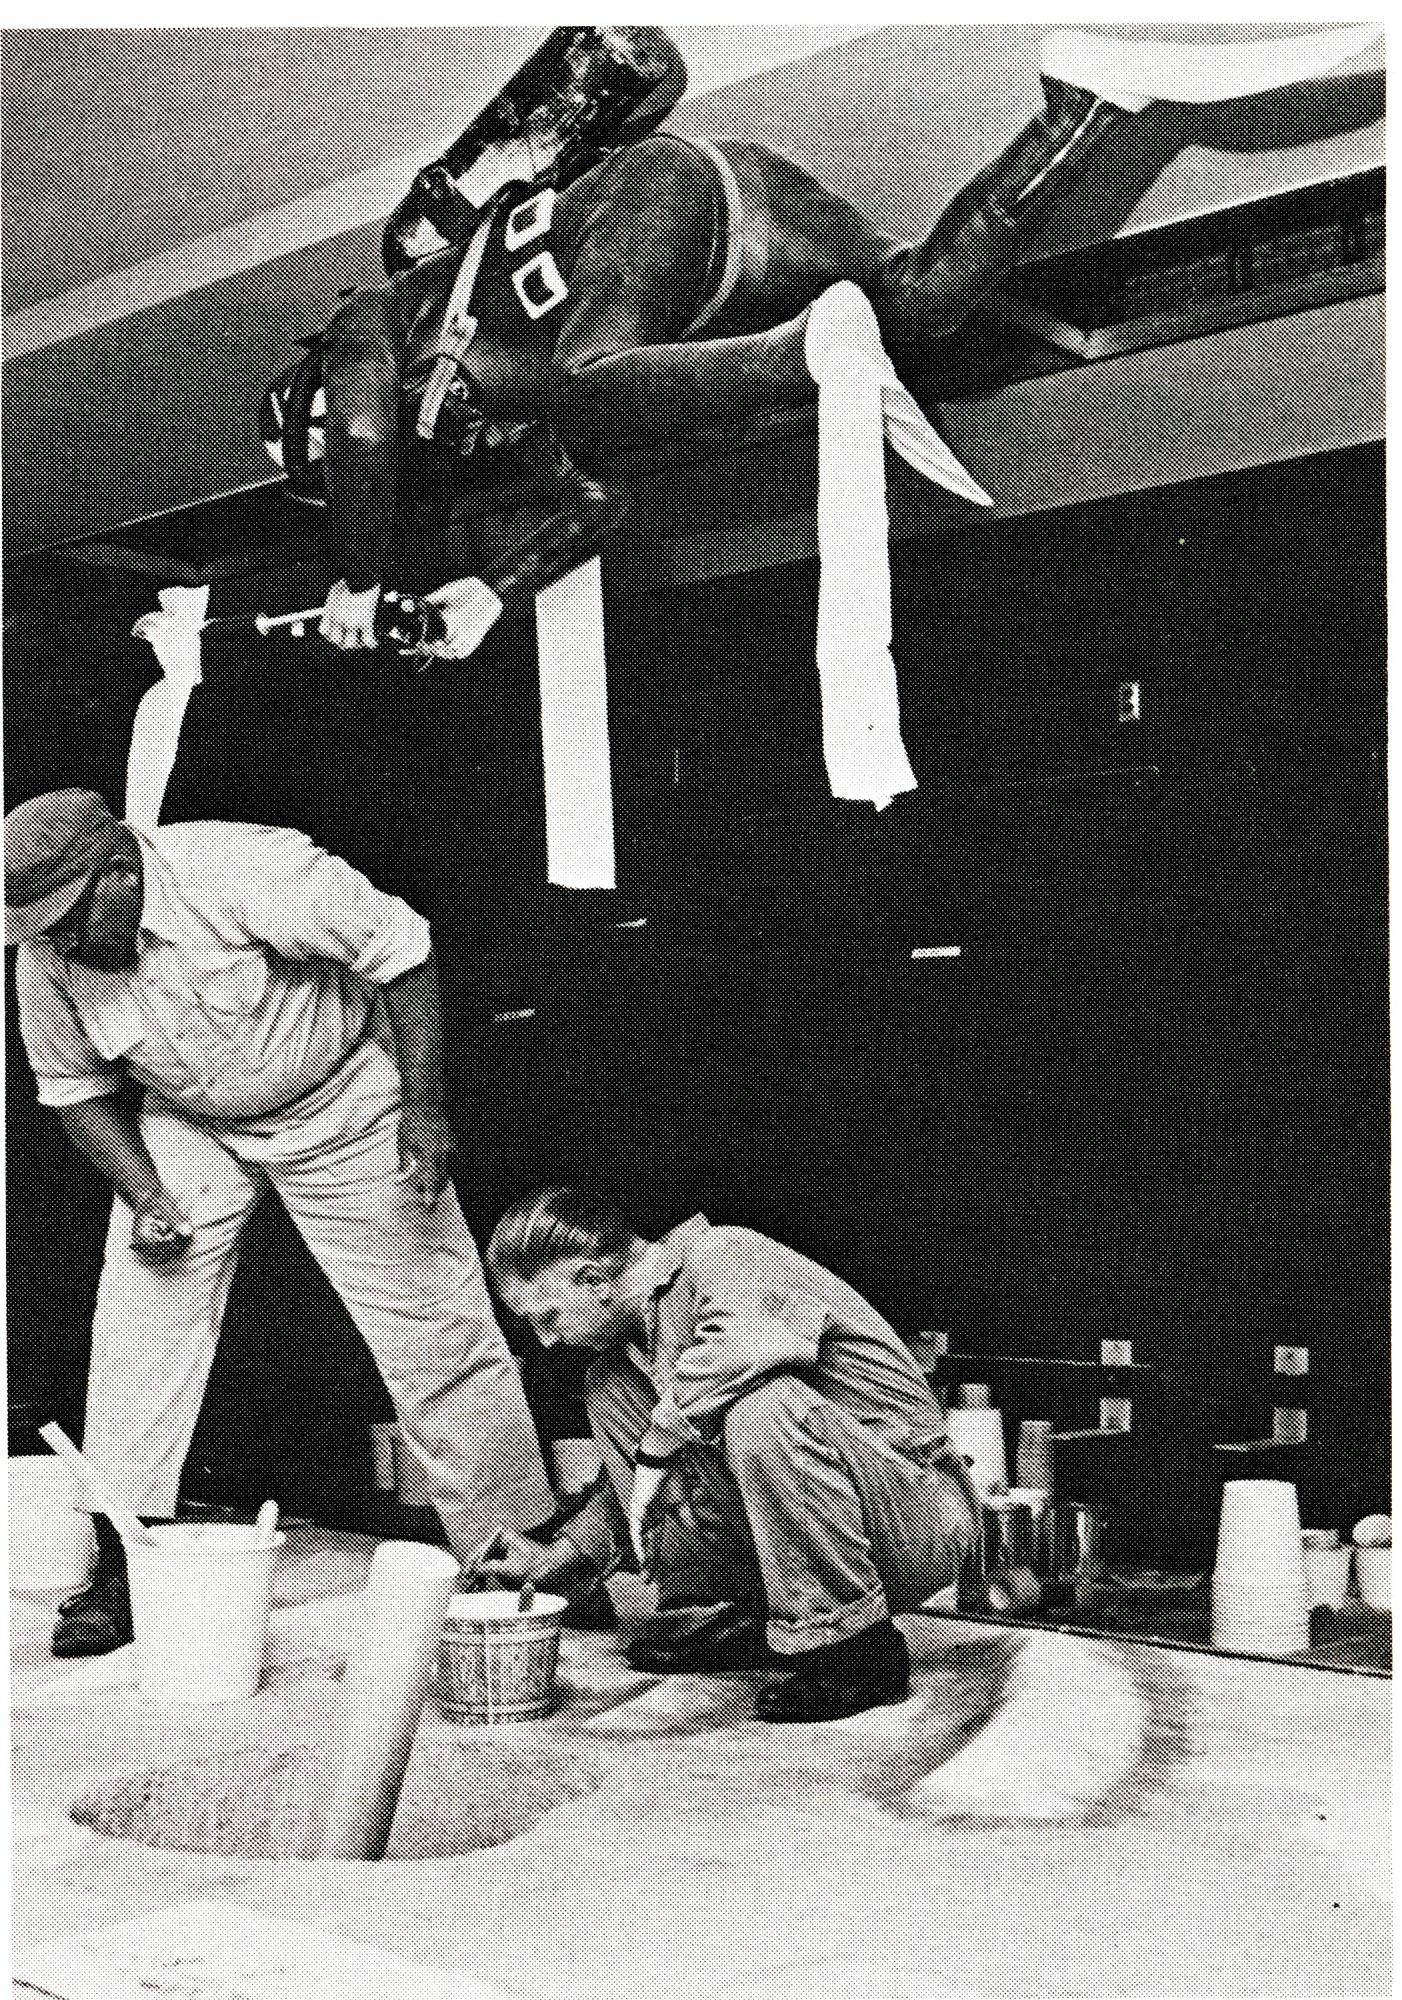 Construction of the Underwater Exploration Exhibit